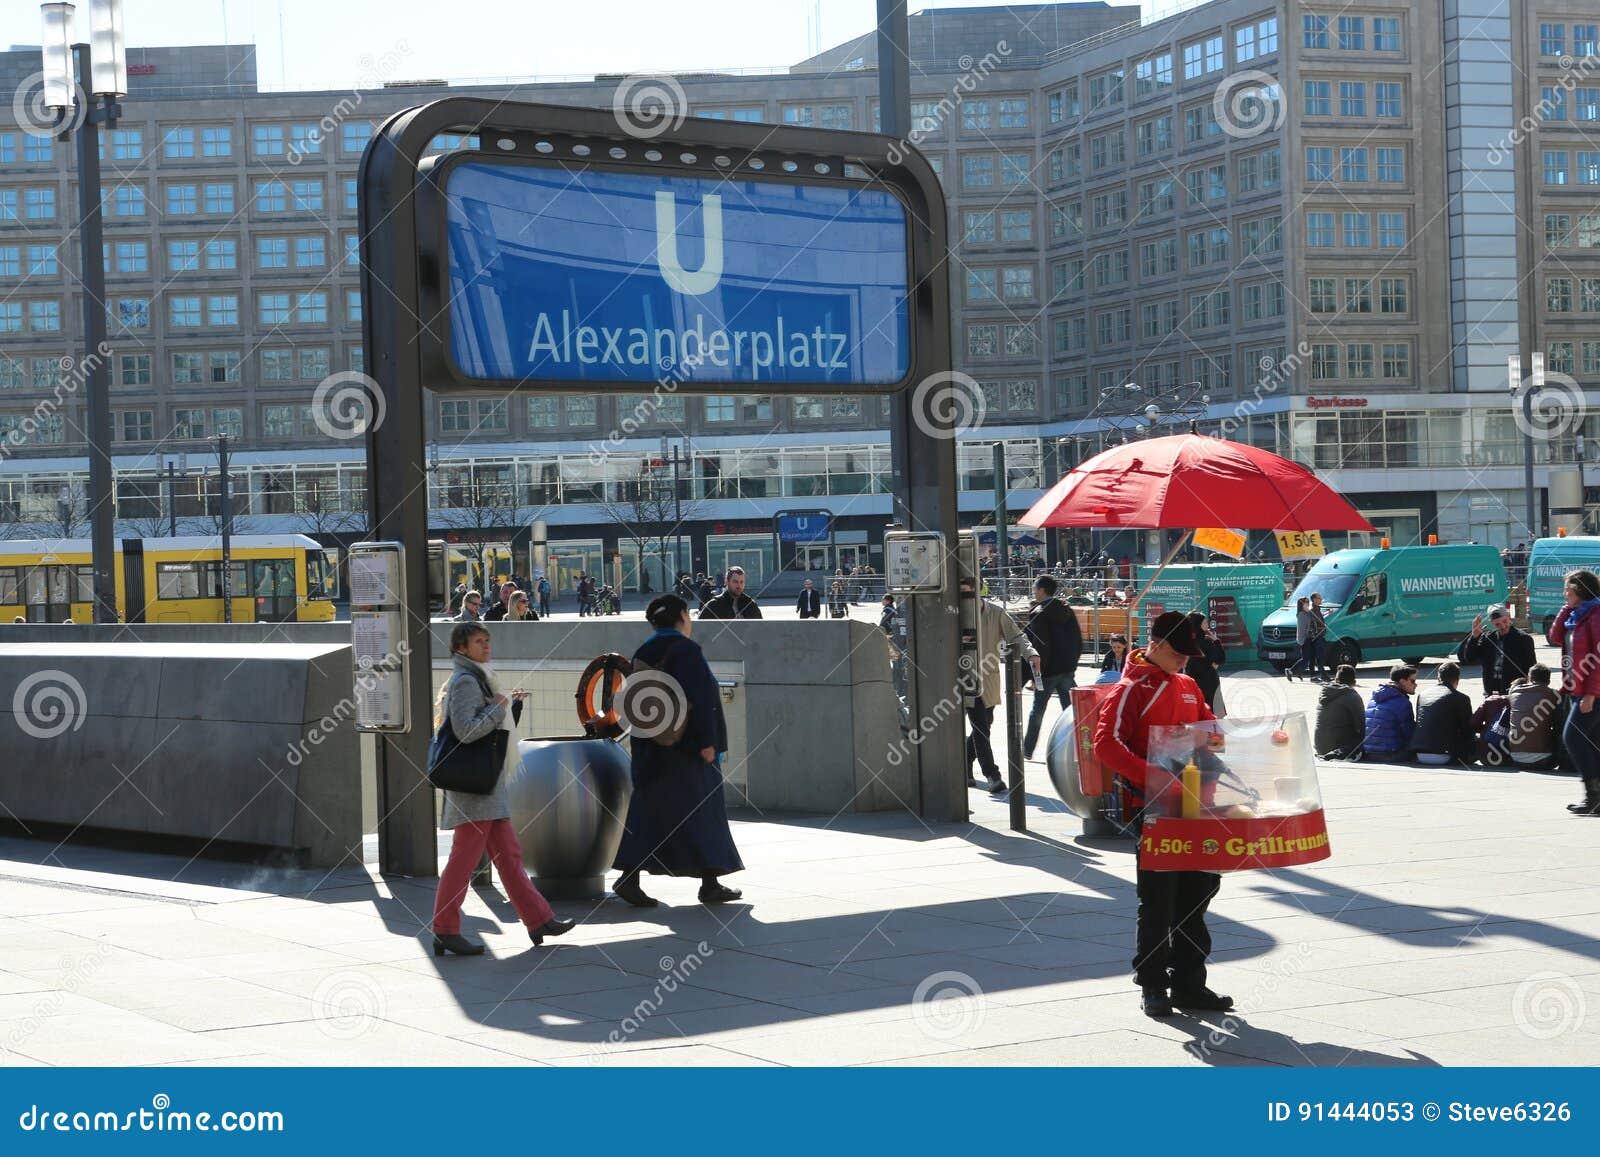 Pity, german public tube